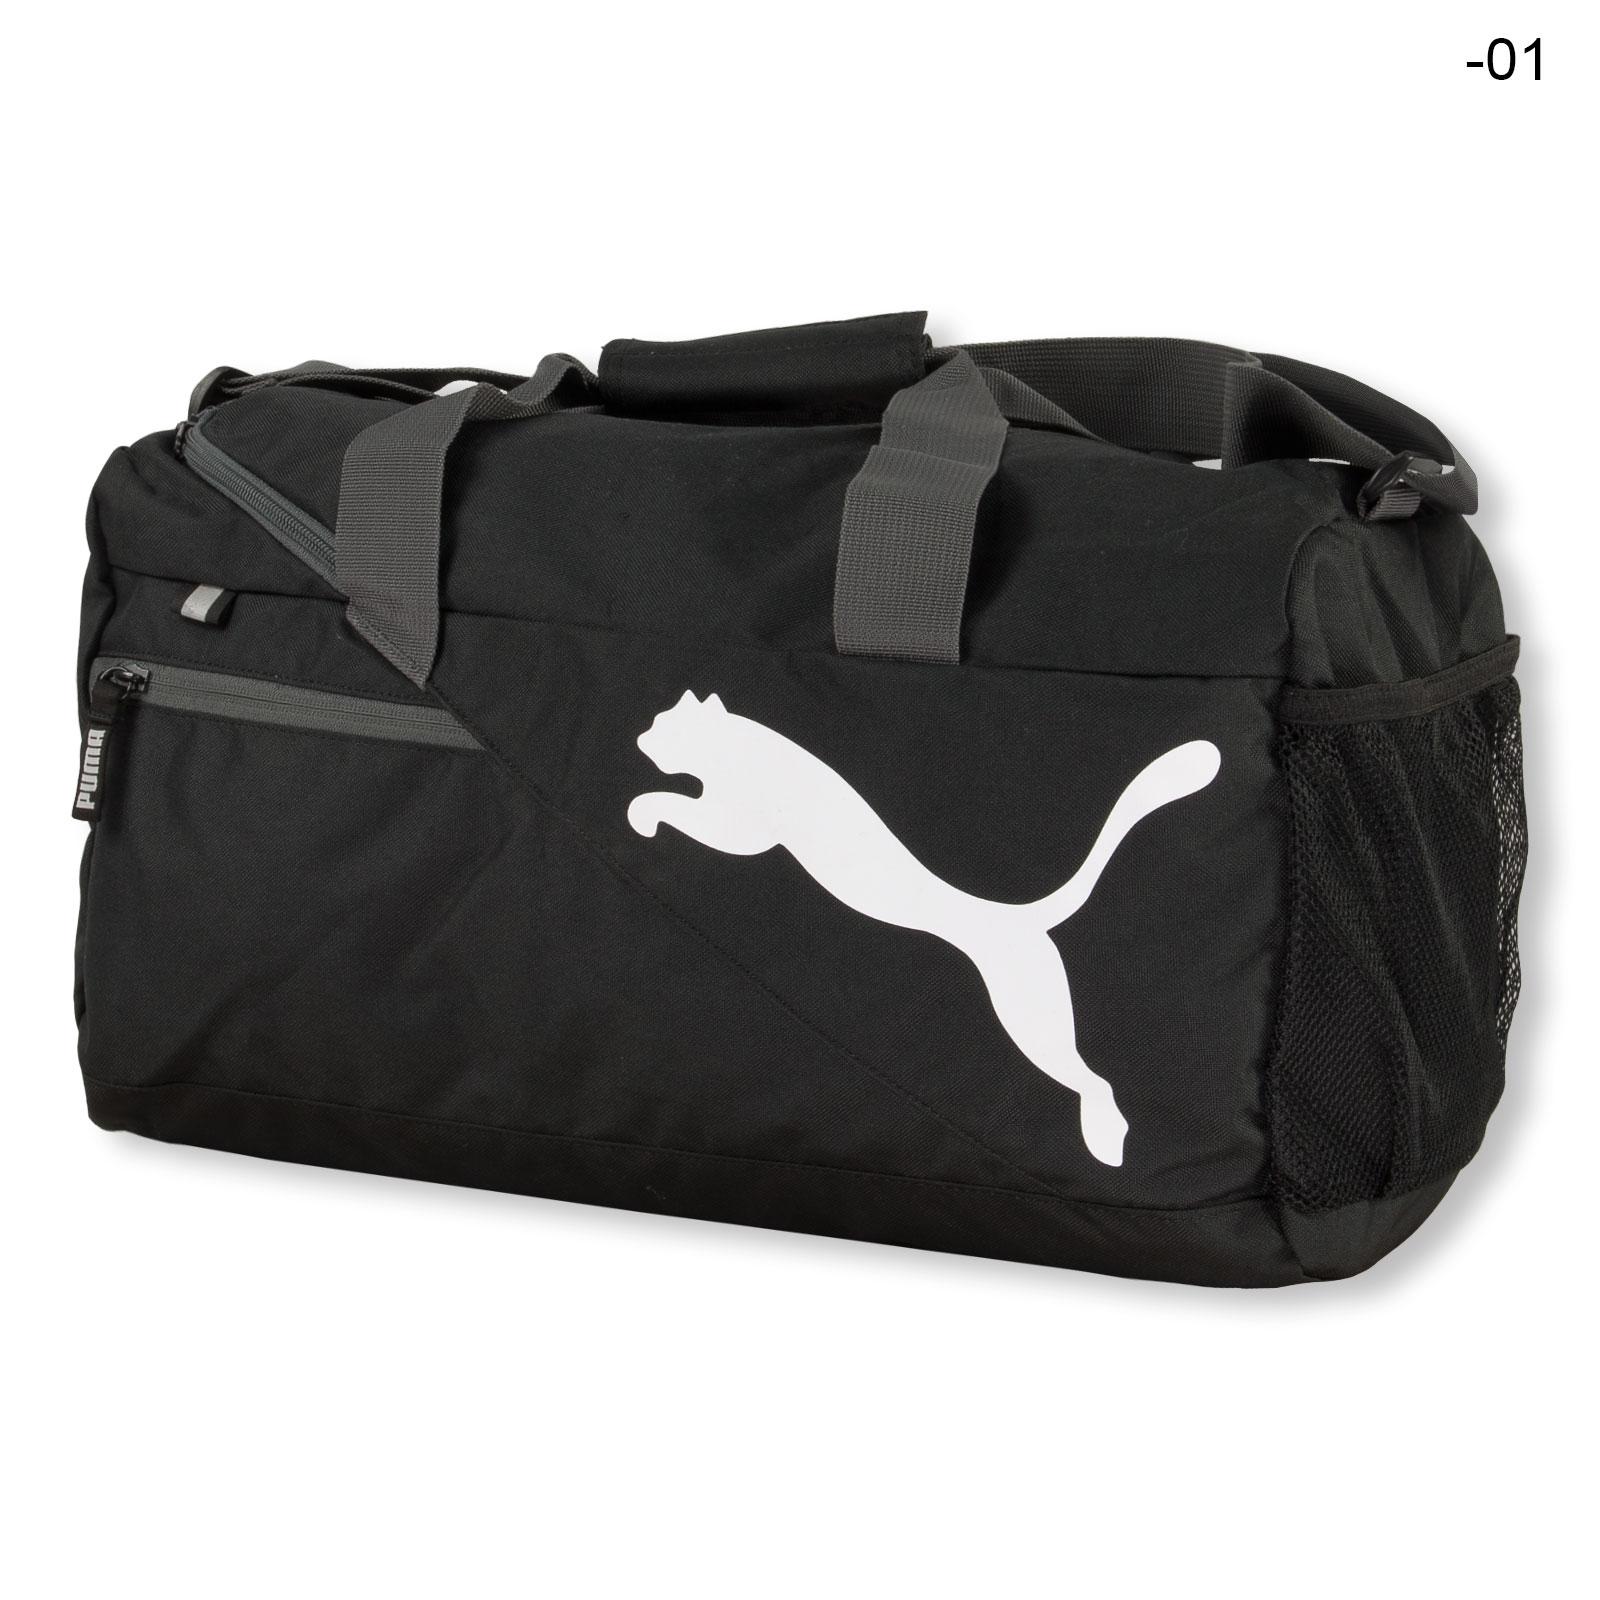 Sporttasche Fundamentals Sports Bag S Farbwahl